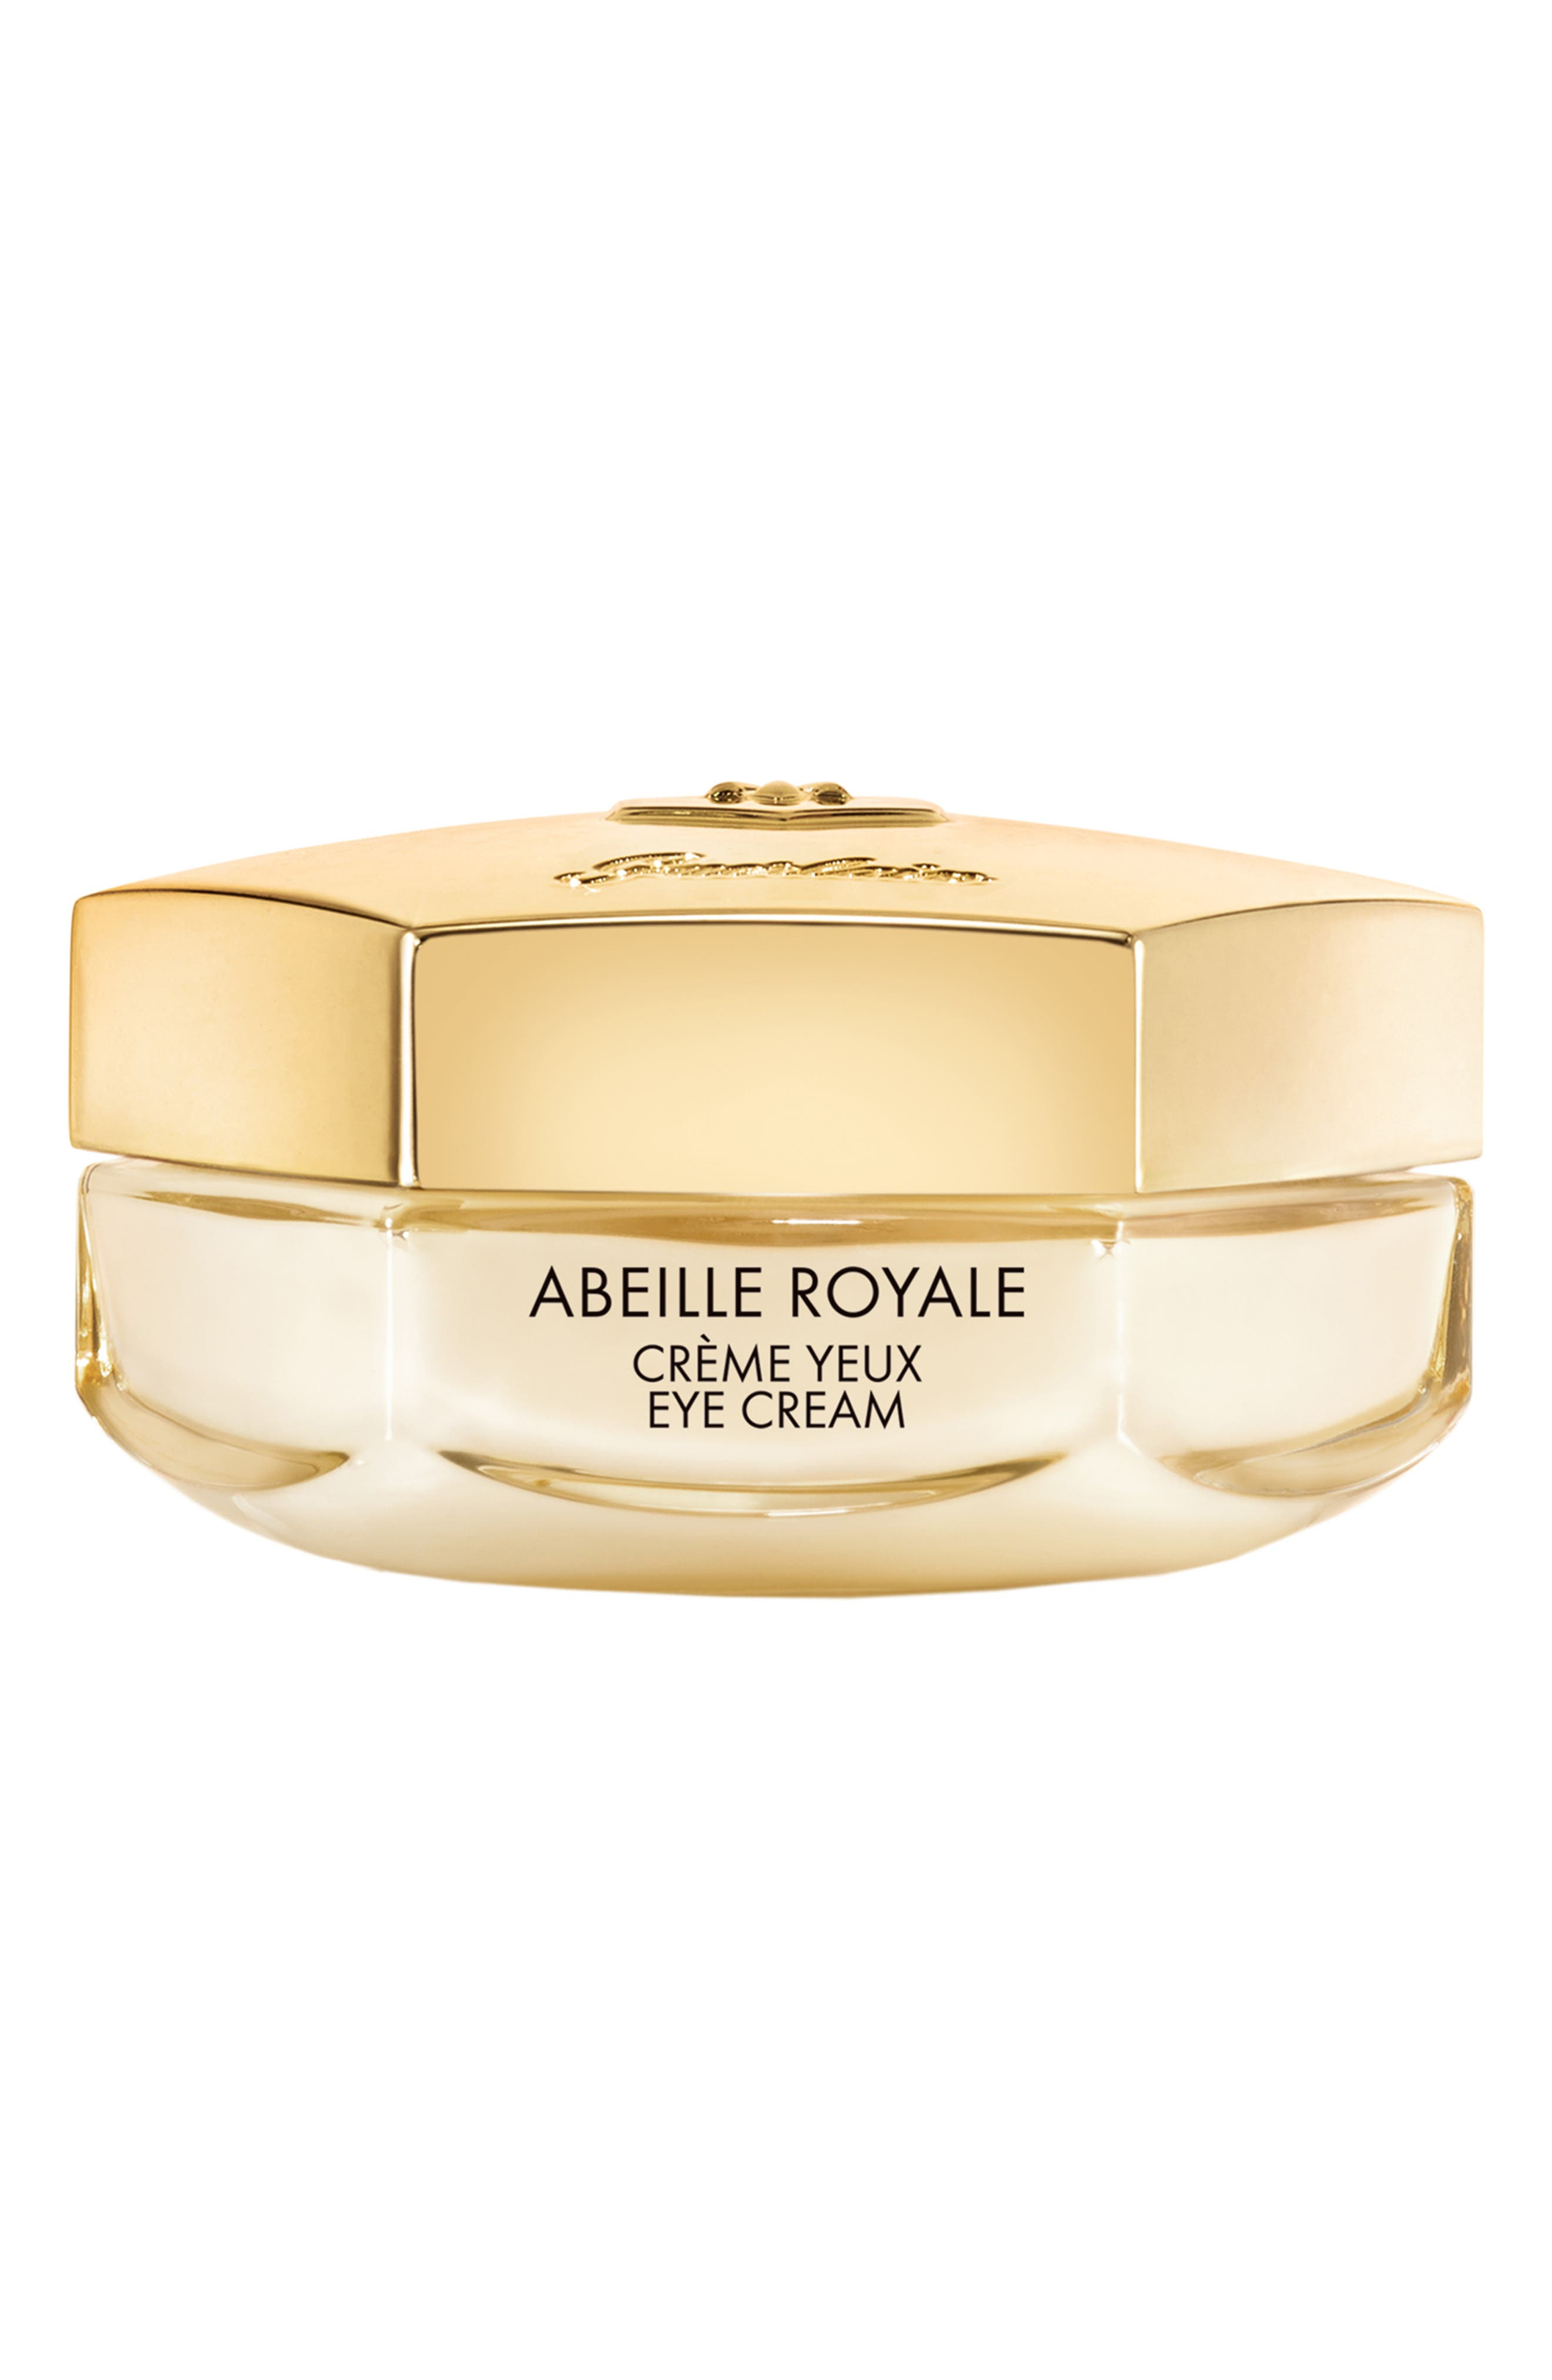 Abeille Royale Anti-Aging Eye Cream